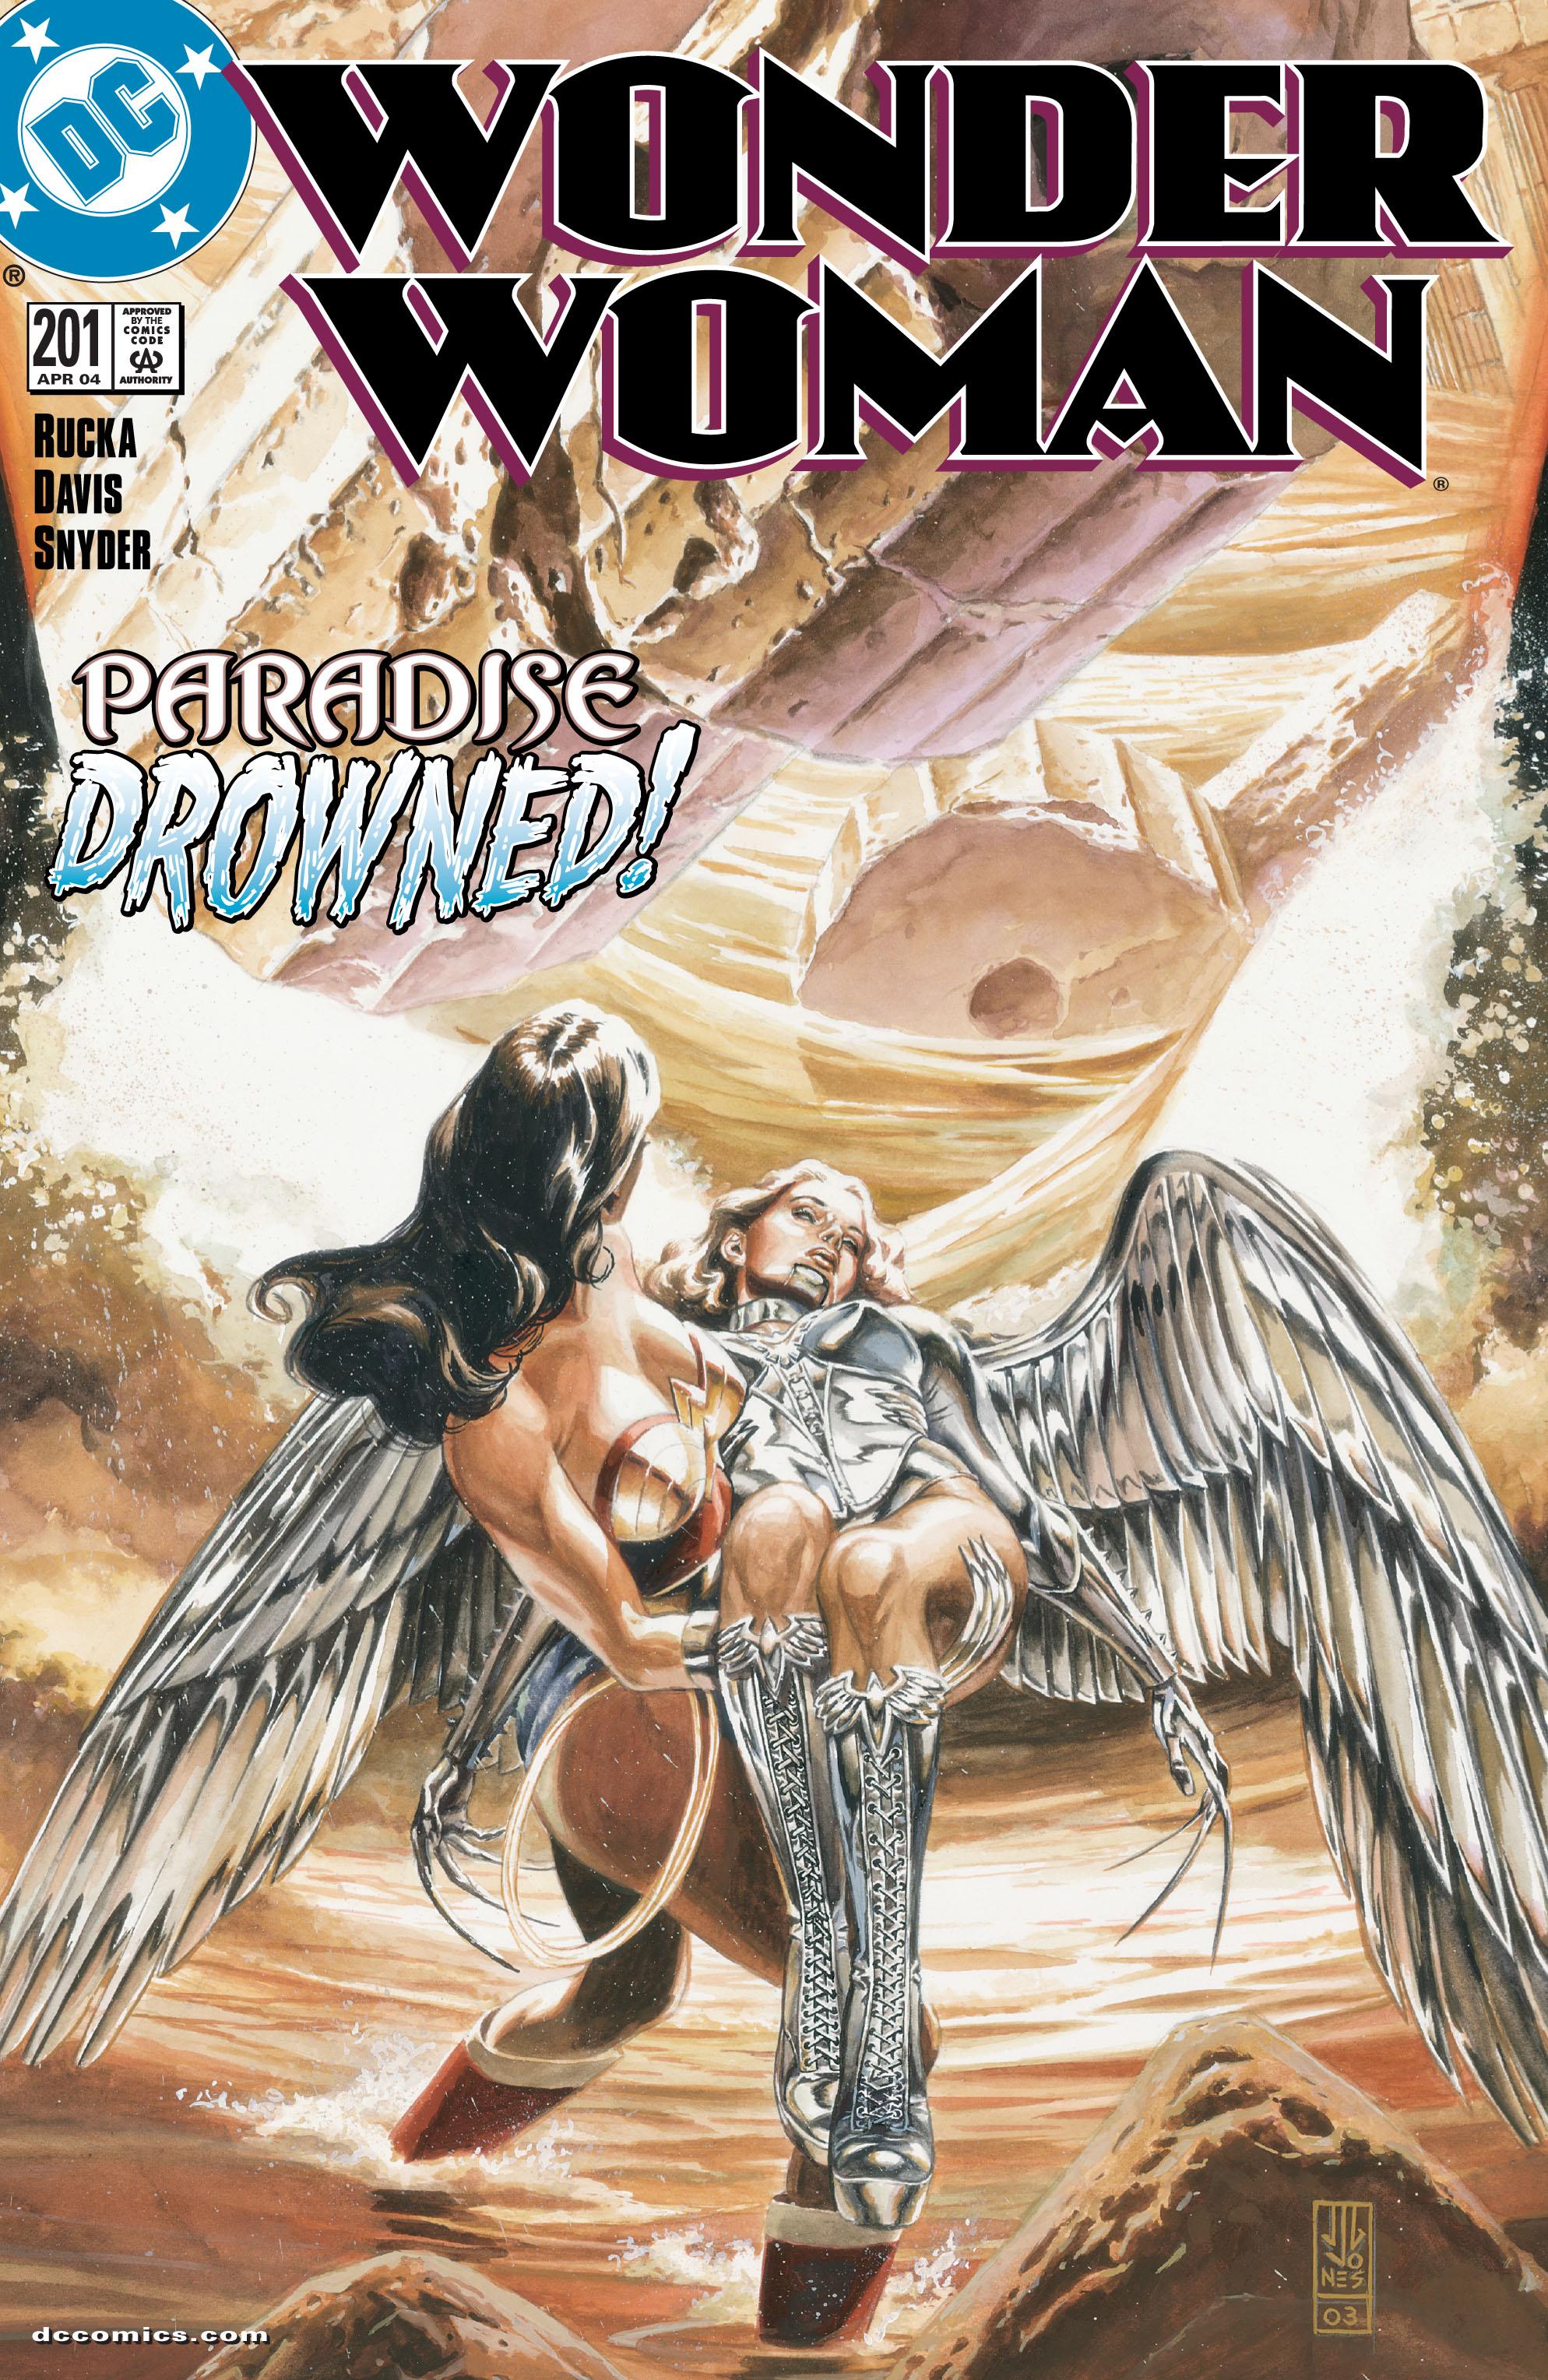 Read online Wonder Woman (1987) comic -  Issue #201 - 1